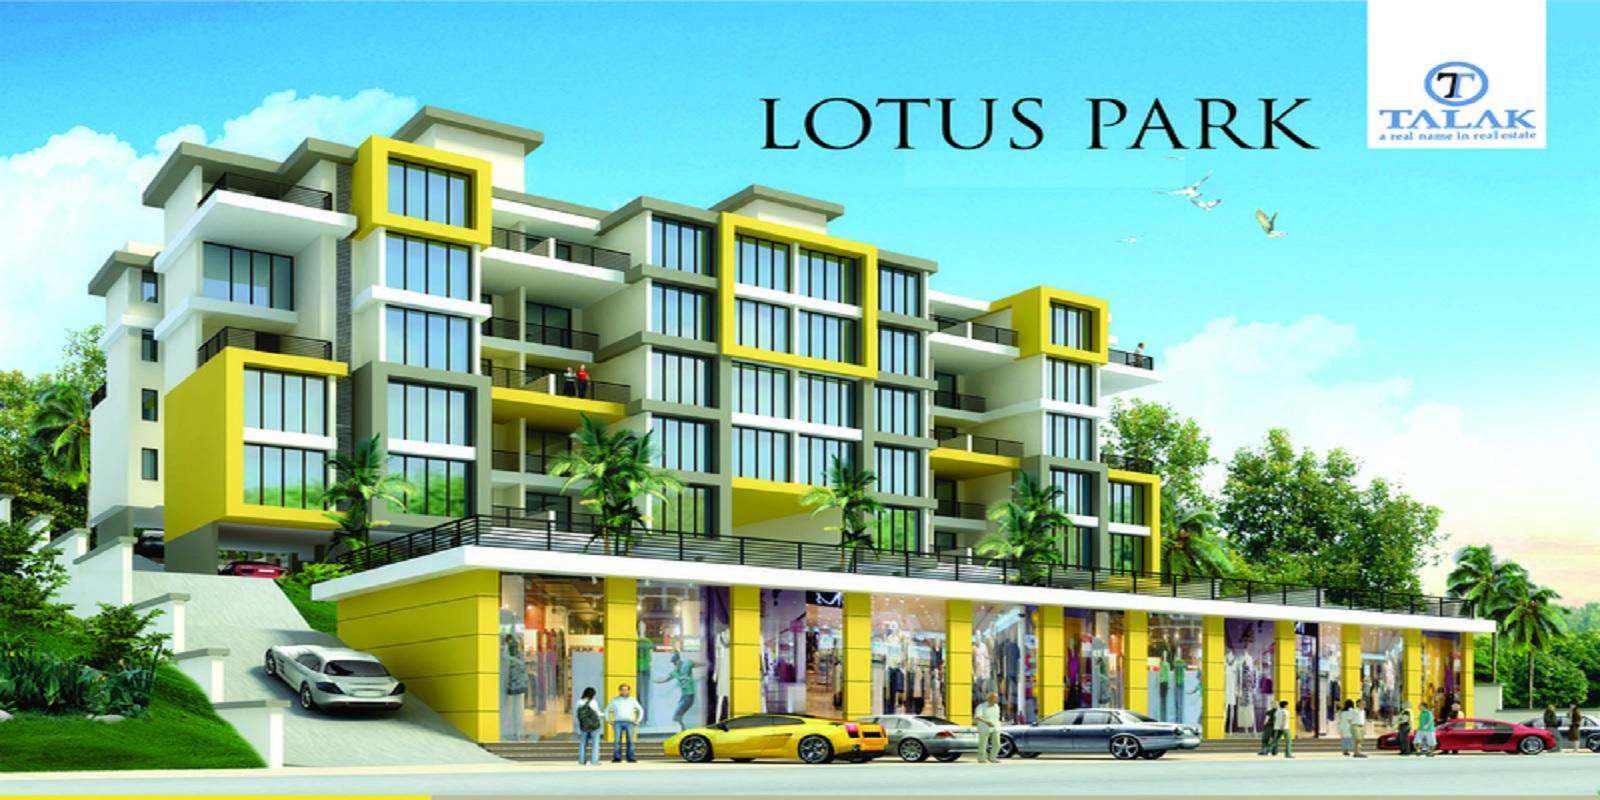 talak lotus park project project large image1